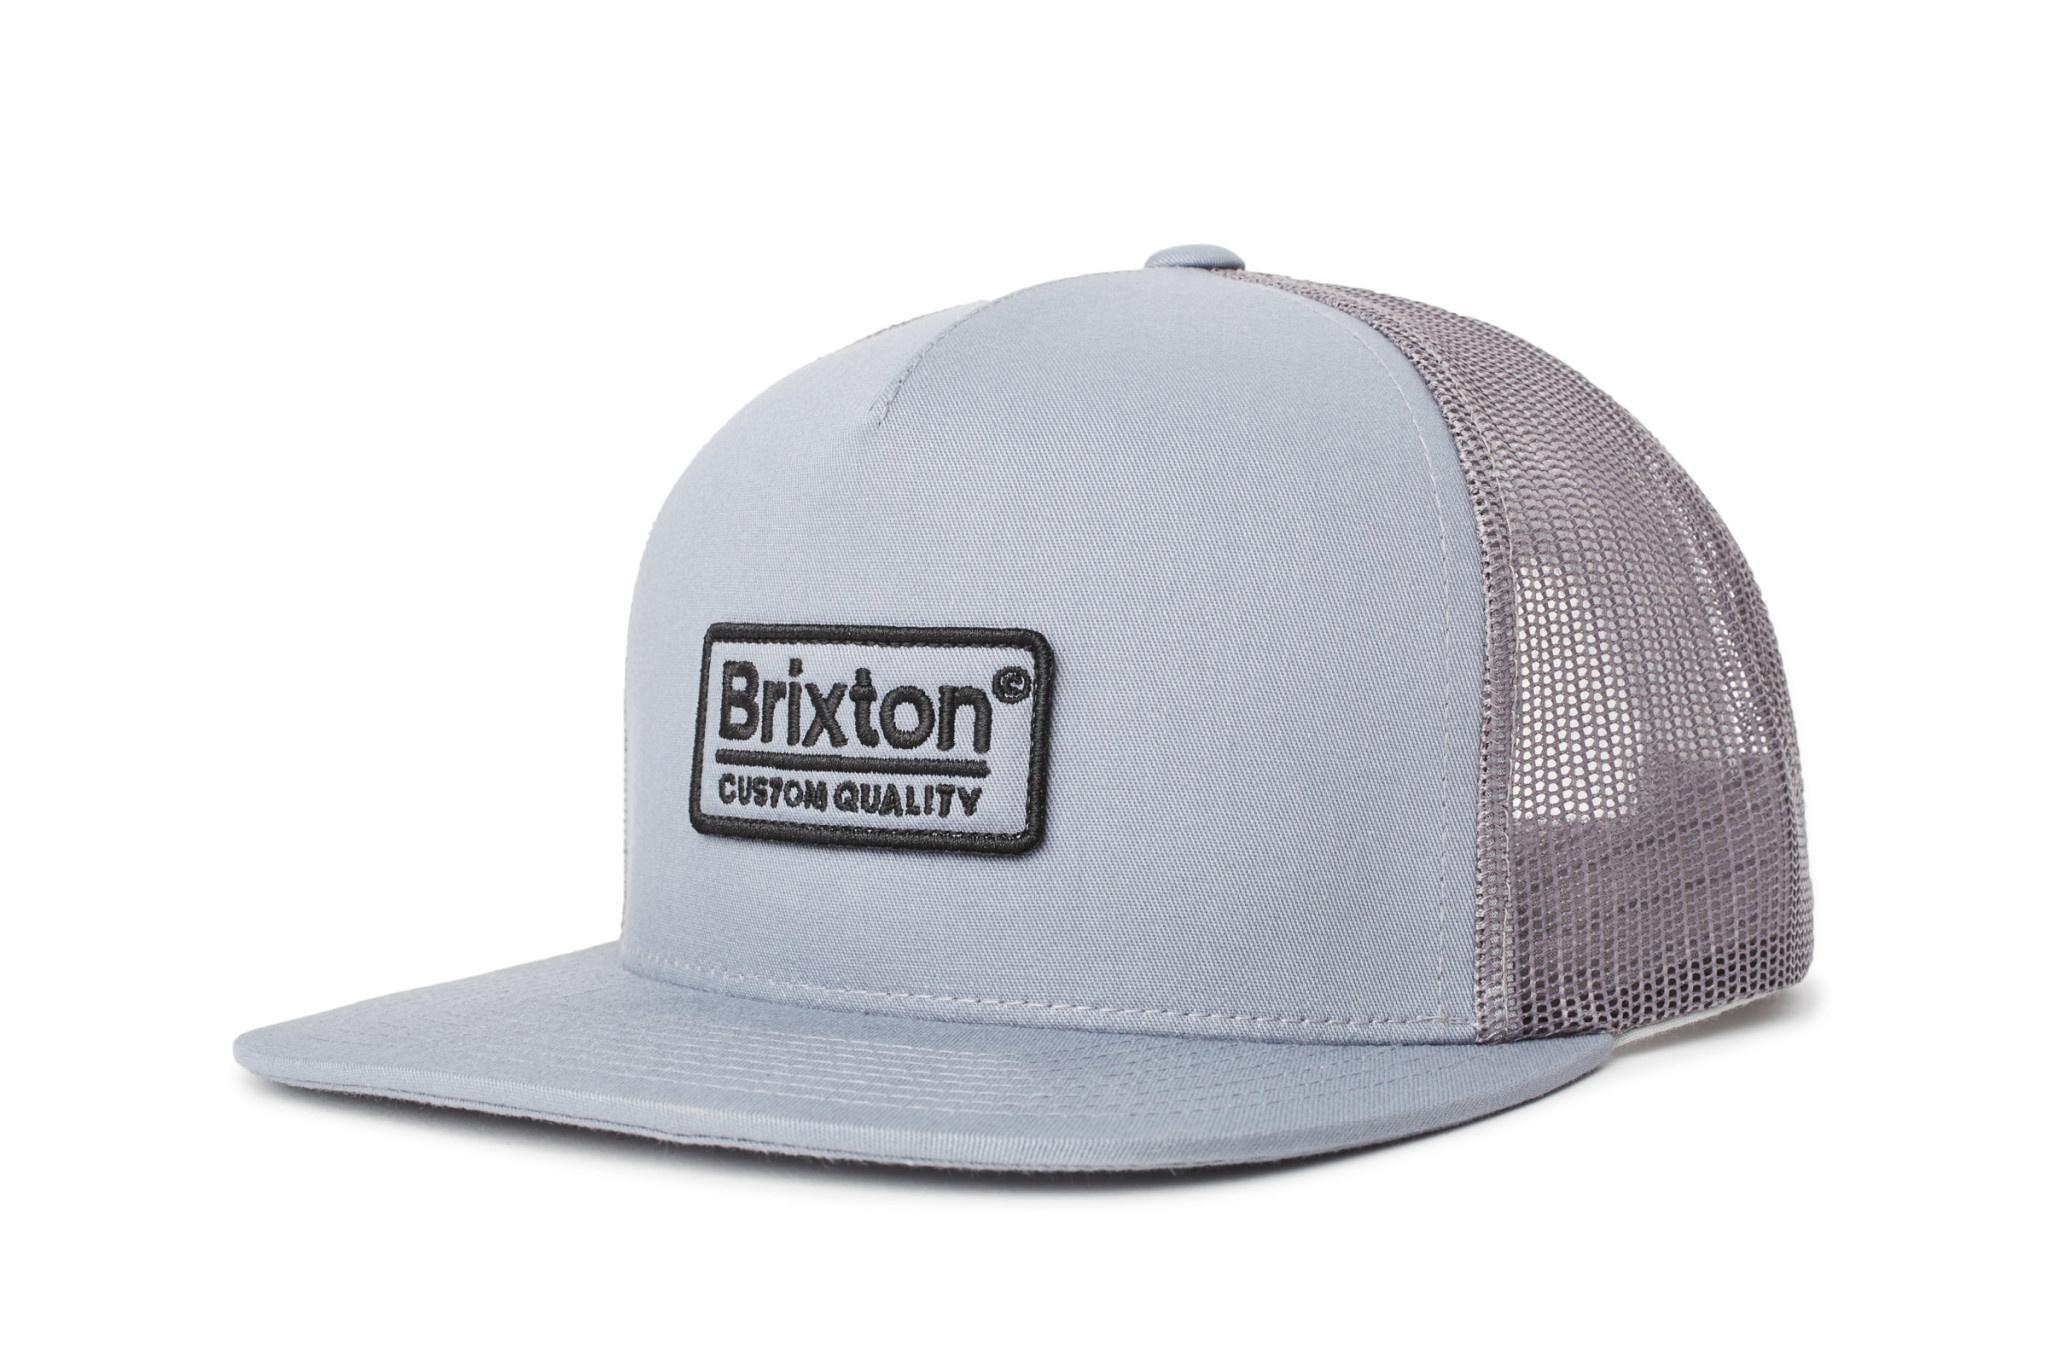 Brixton Brixton Palmer Mesh Cap - Grey/Black